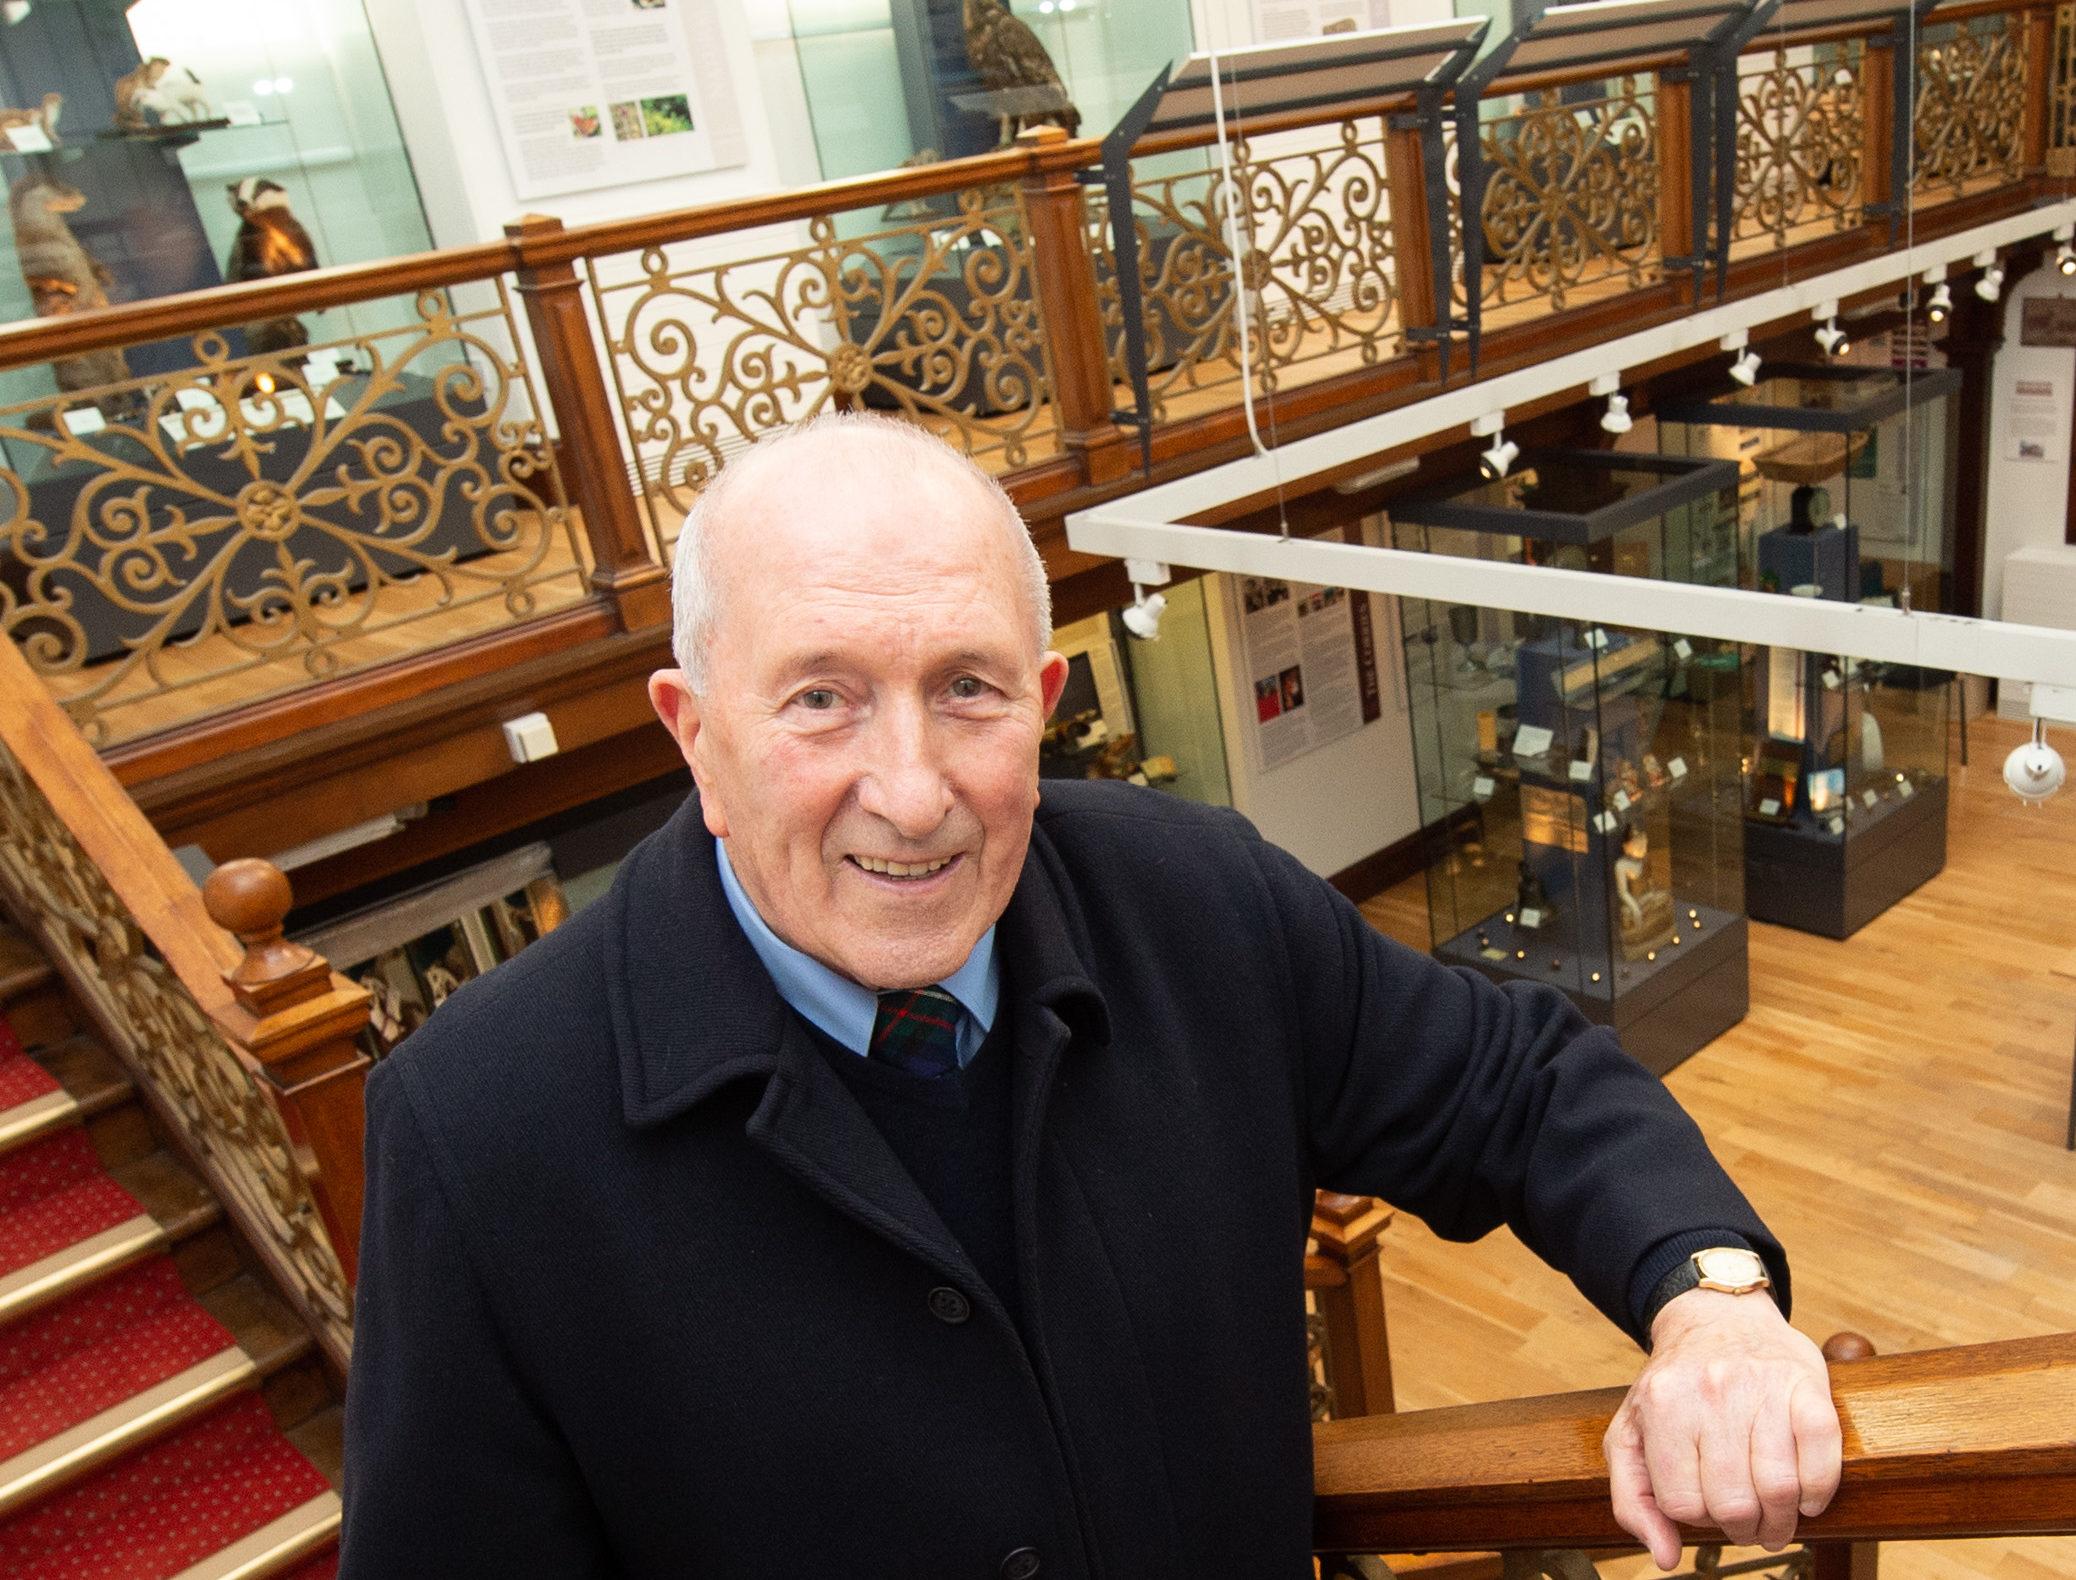 Gordon Ferguson inside the Falconer Museum. Picture by Jason Hedges